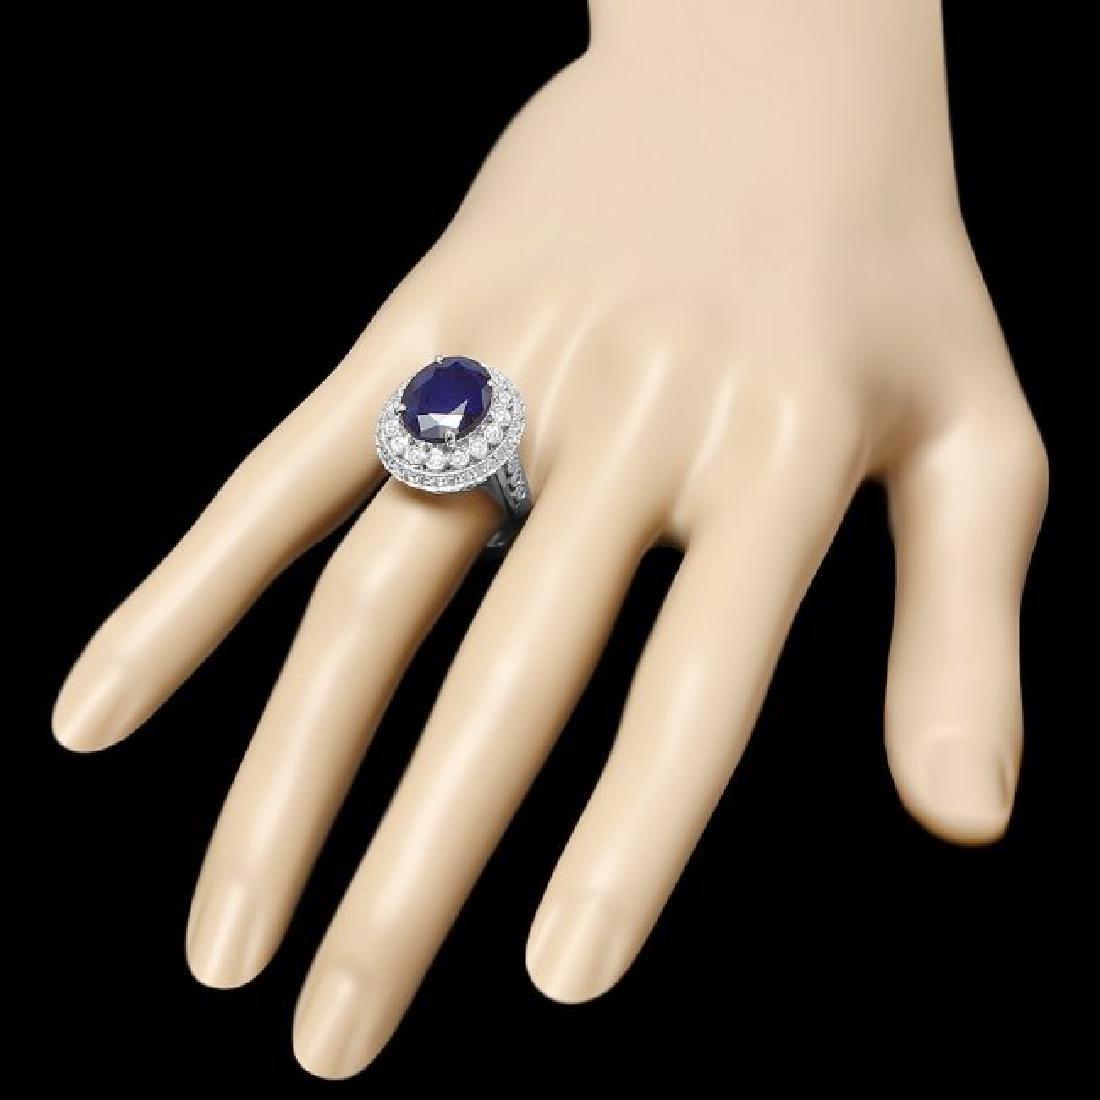 14k Gold 5.20ct Sapphire 0.85ct Diamond Ring - 3